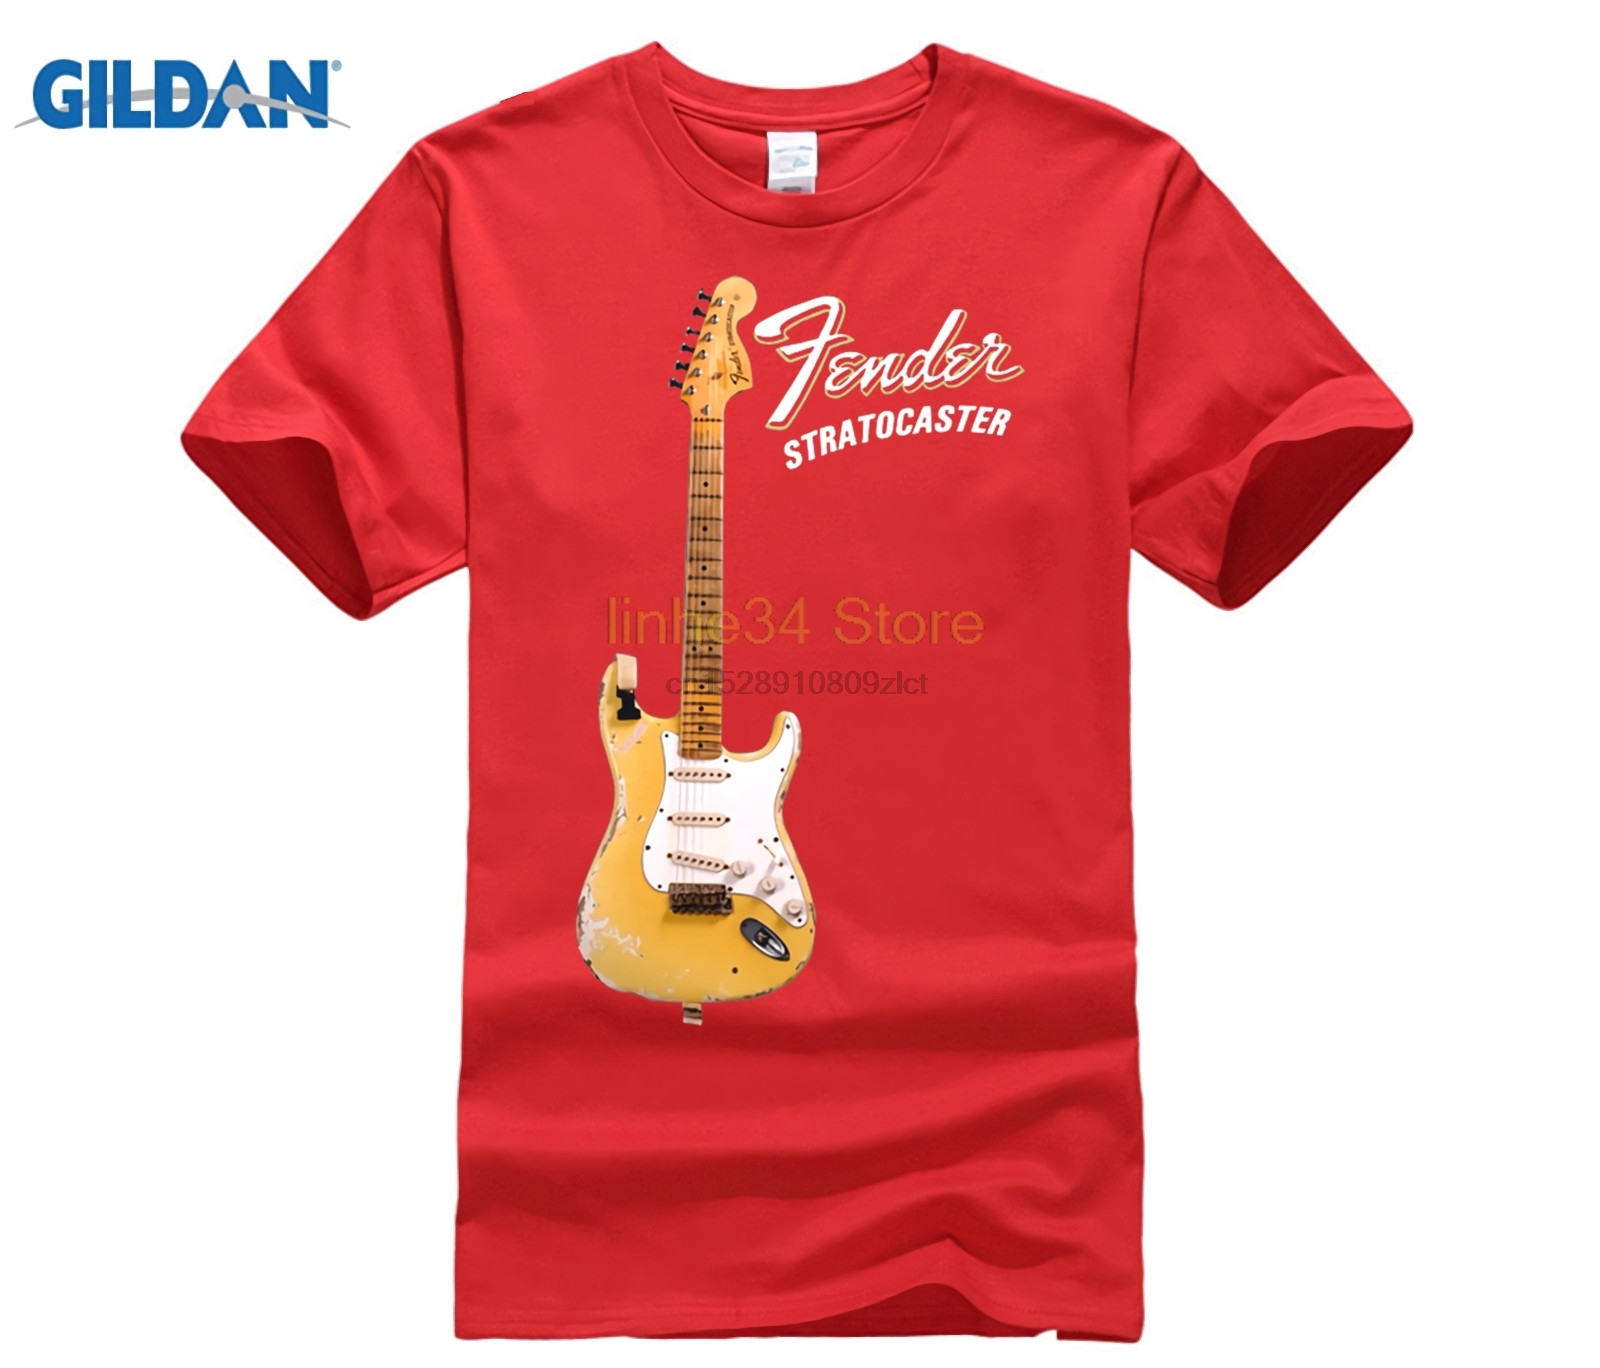 100% Cotton Print Shirts customized T-shirt YNGWIE MALMSTEEN Stratocaster Electric Guitar T-Shirt Black